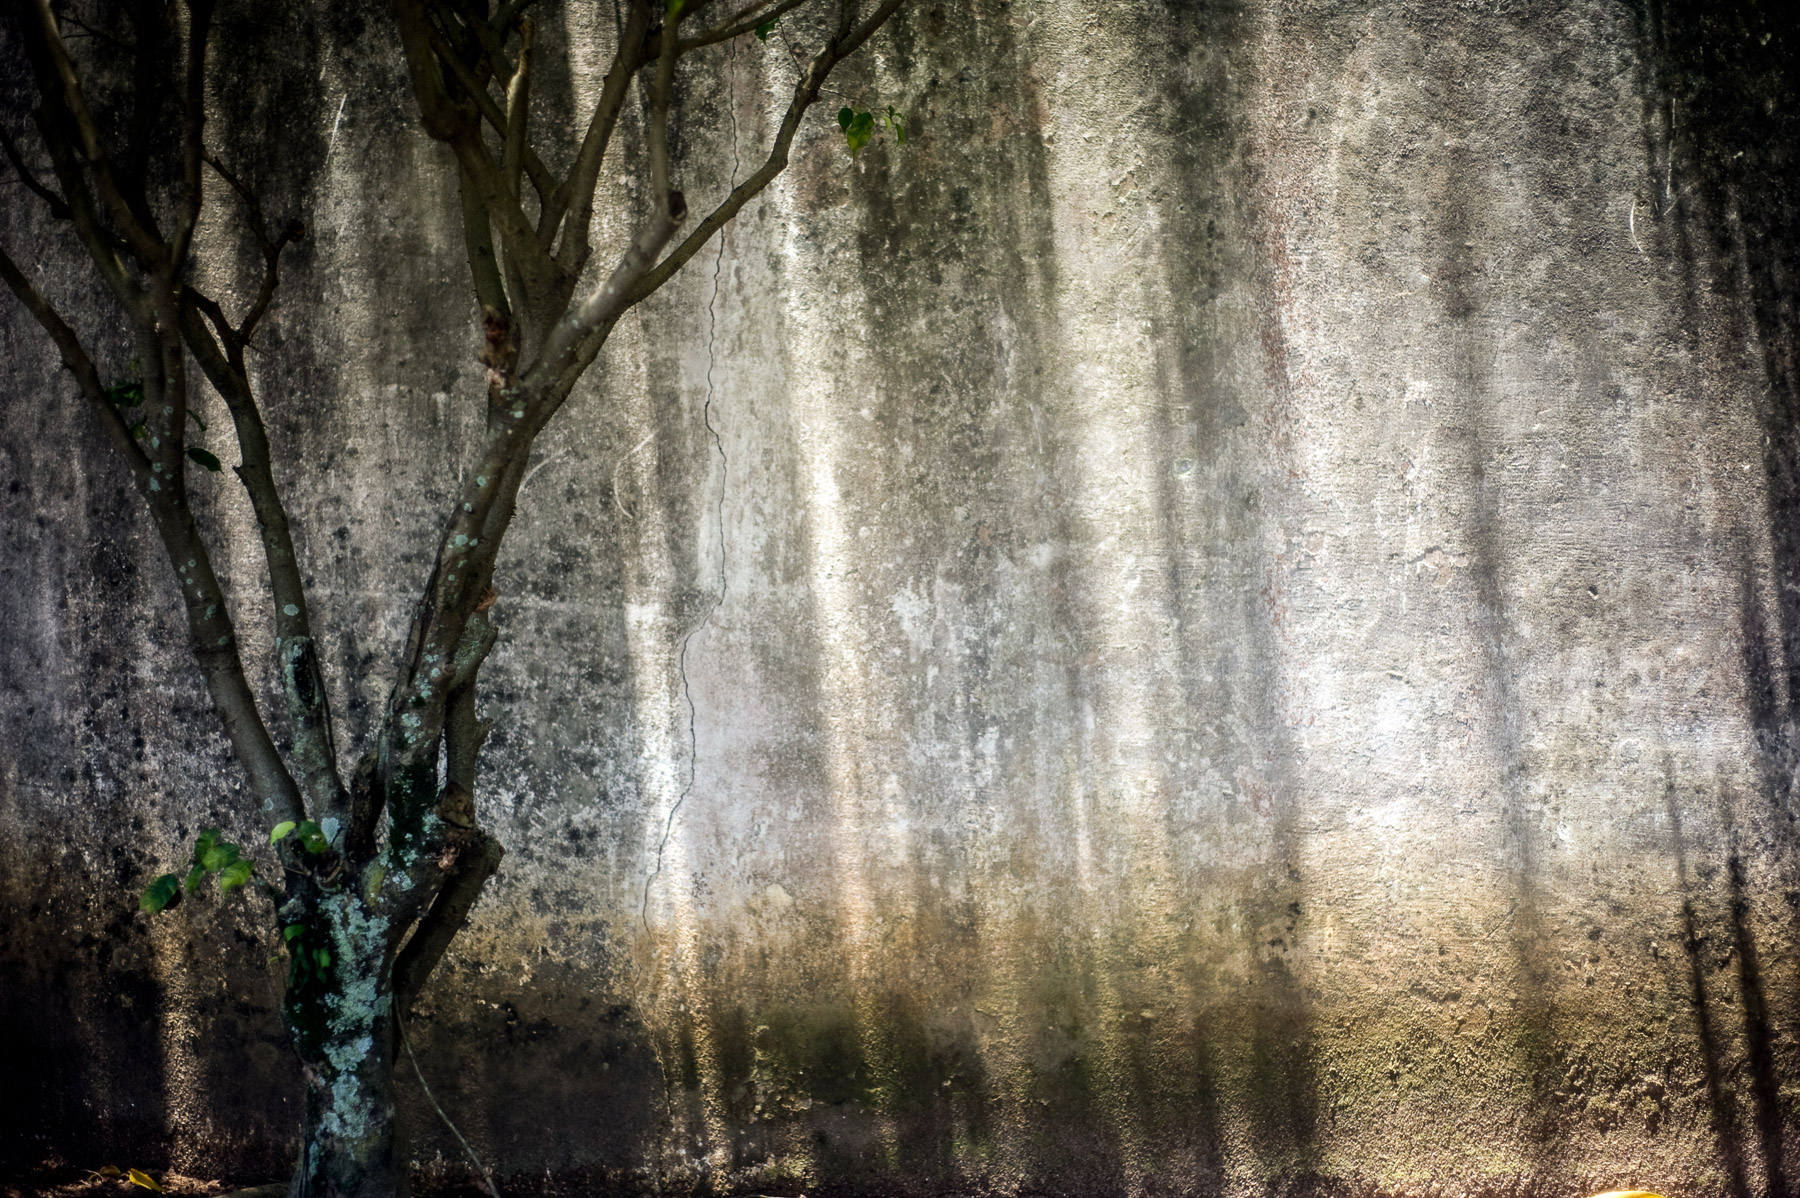 patricia-vanrespaille-photographer-life-through-my-lens-033.jpg